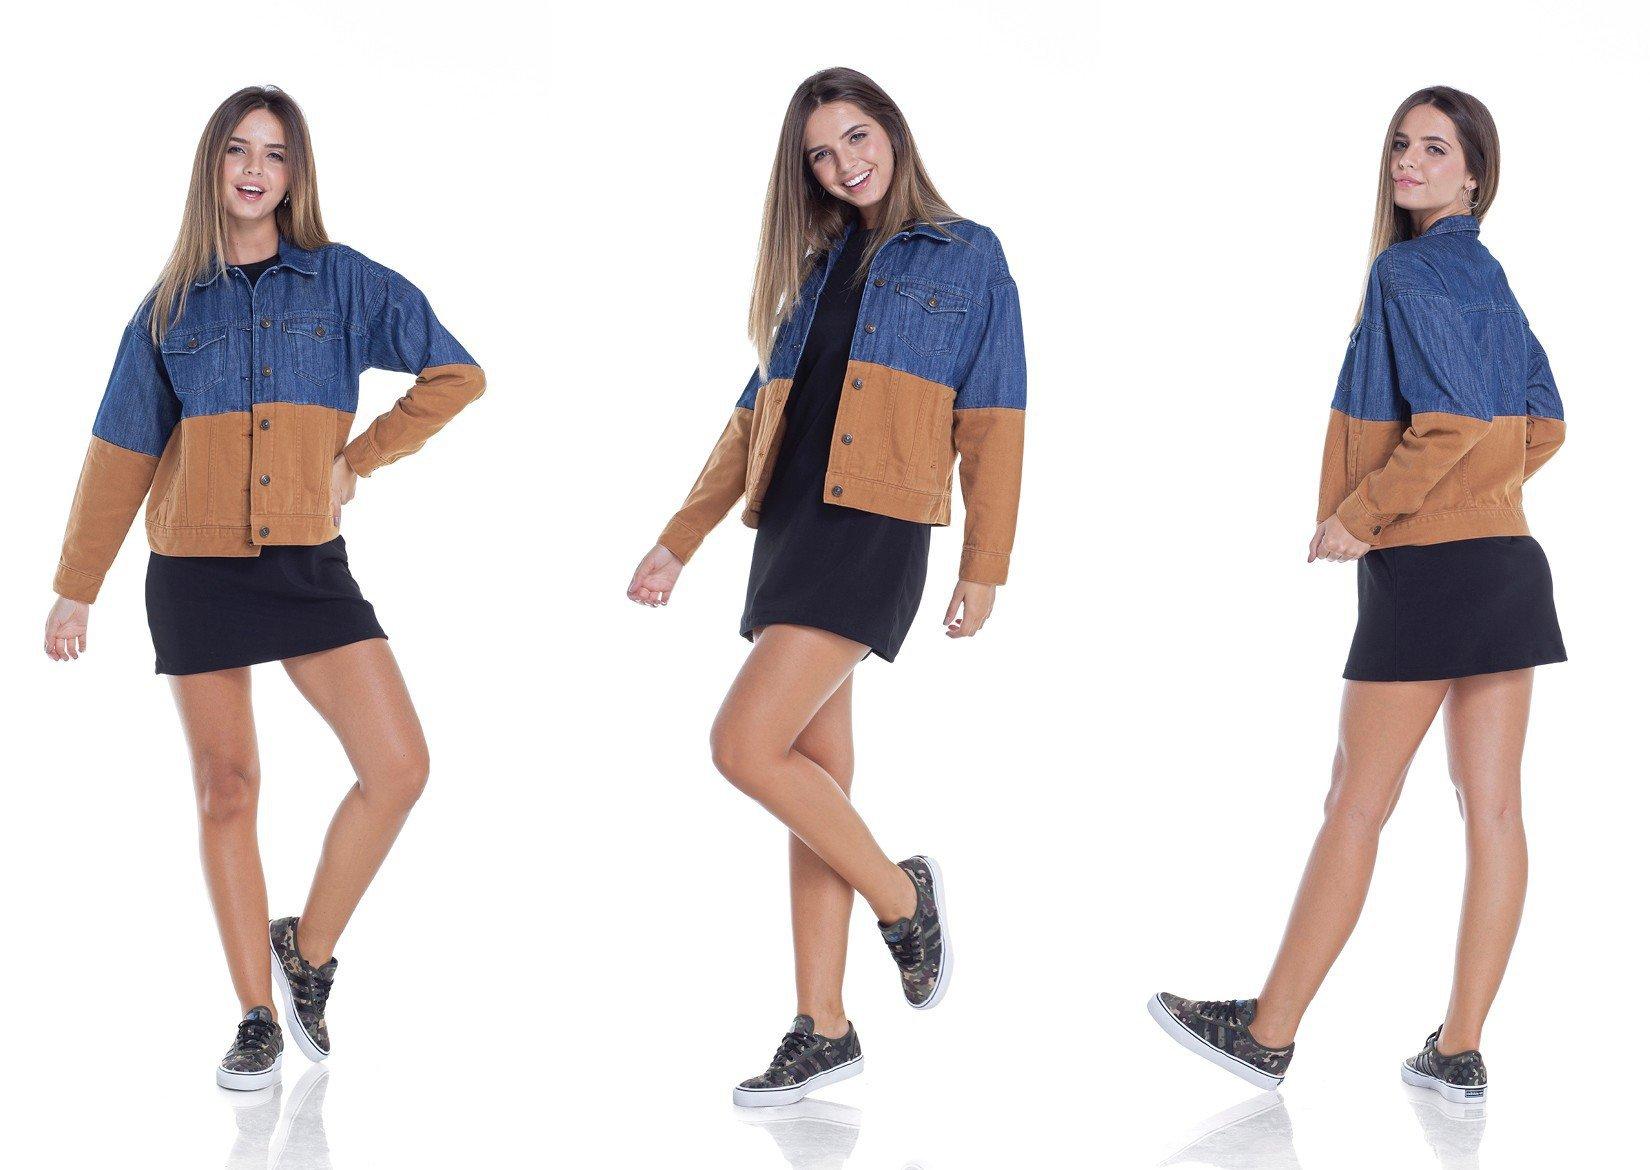 dz9093 jaqueta feminina retro com recortes tripla denim zero